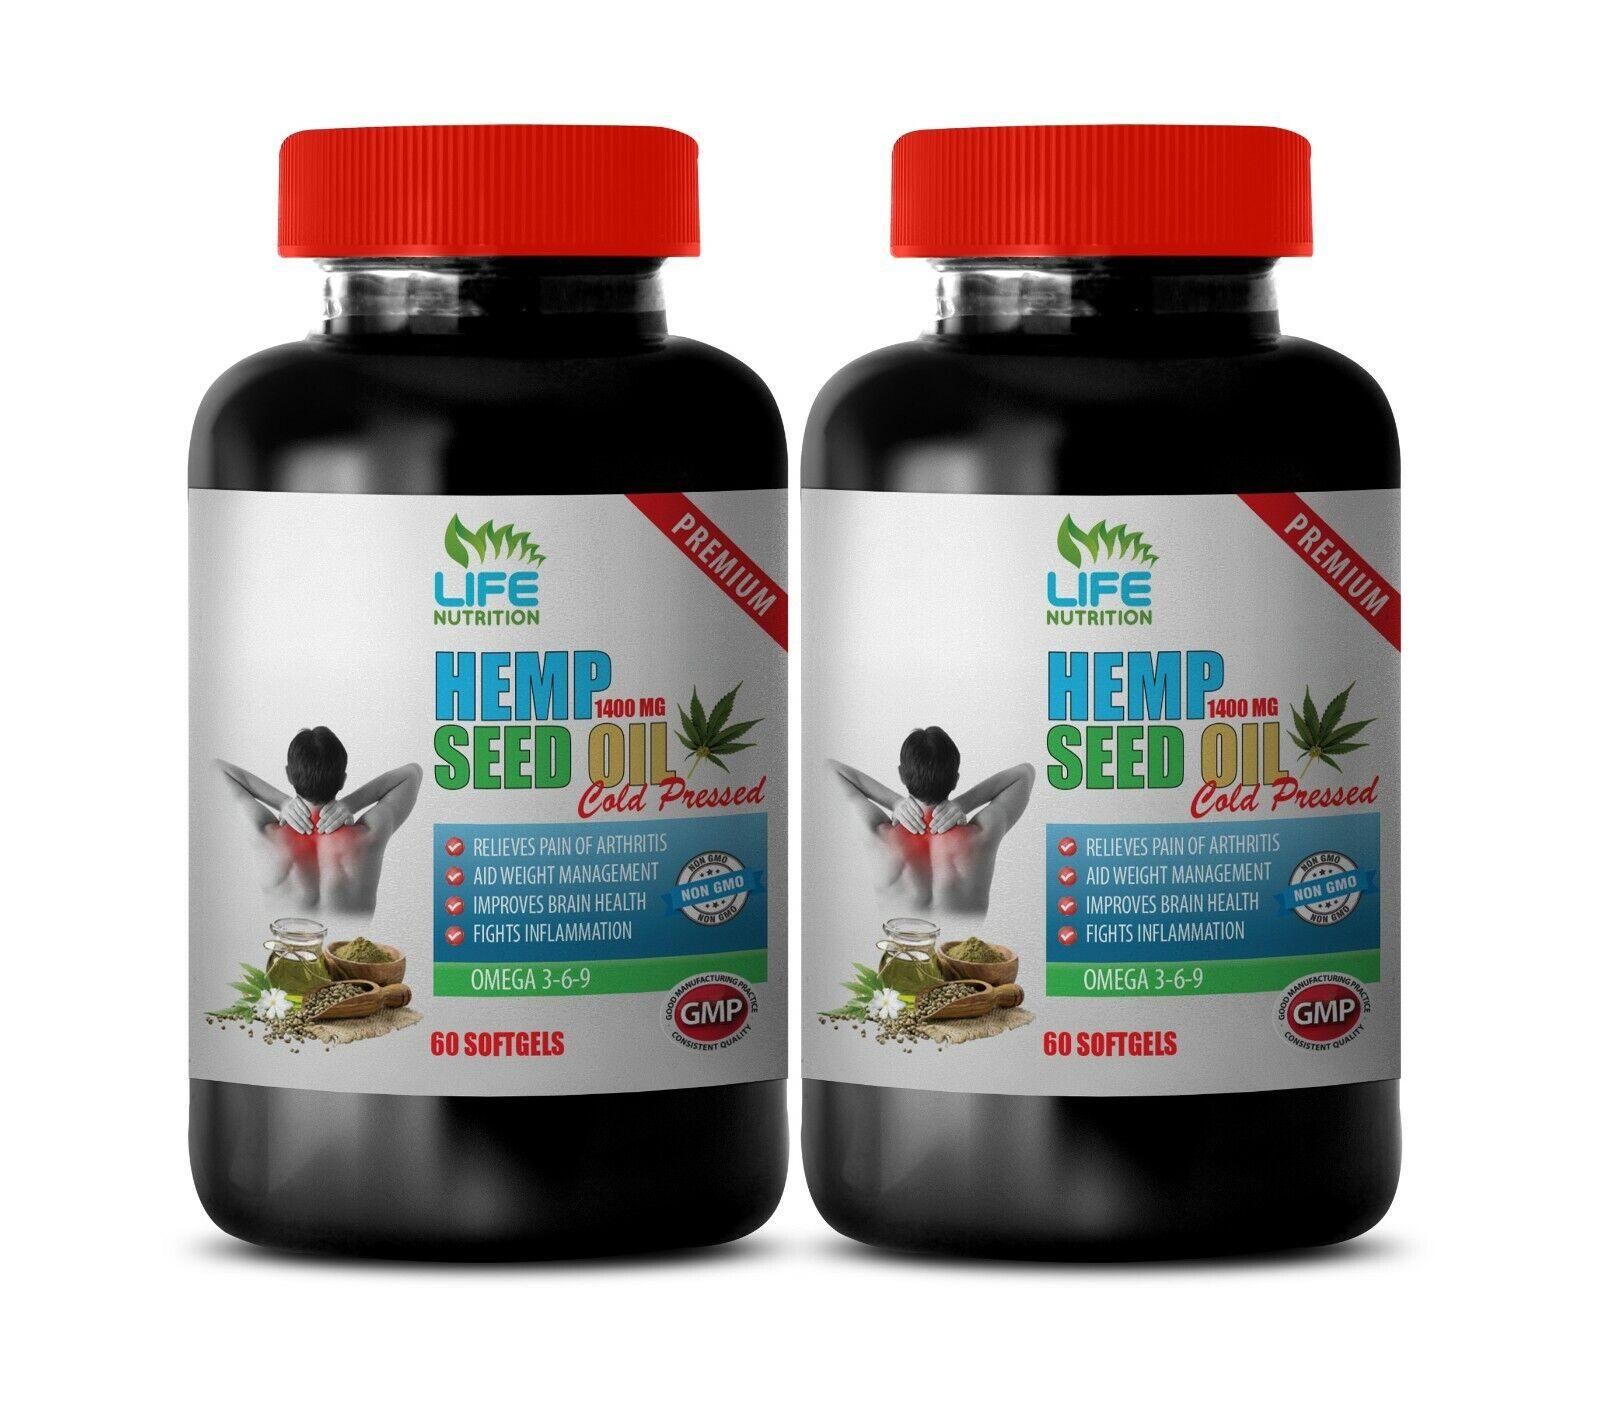 dietary supplement, ORGANIC HEMP SEED OIL 1400mg, digestive health oils 2B